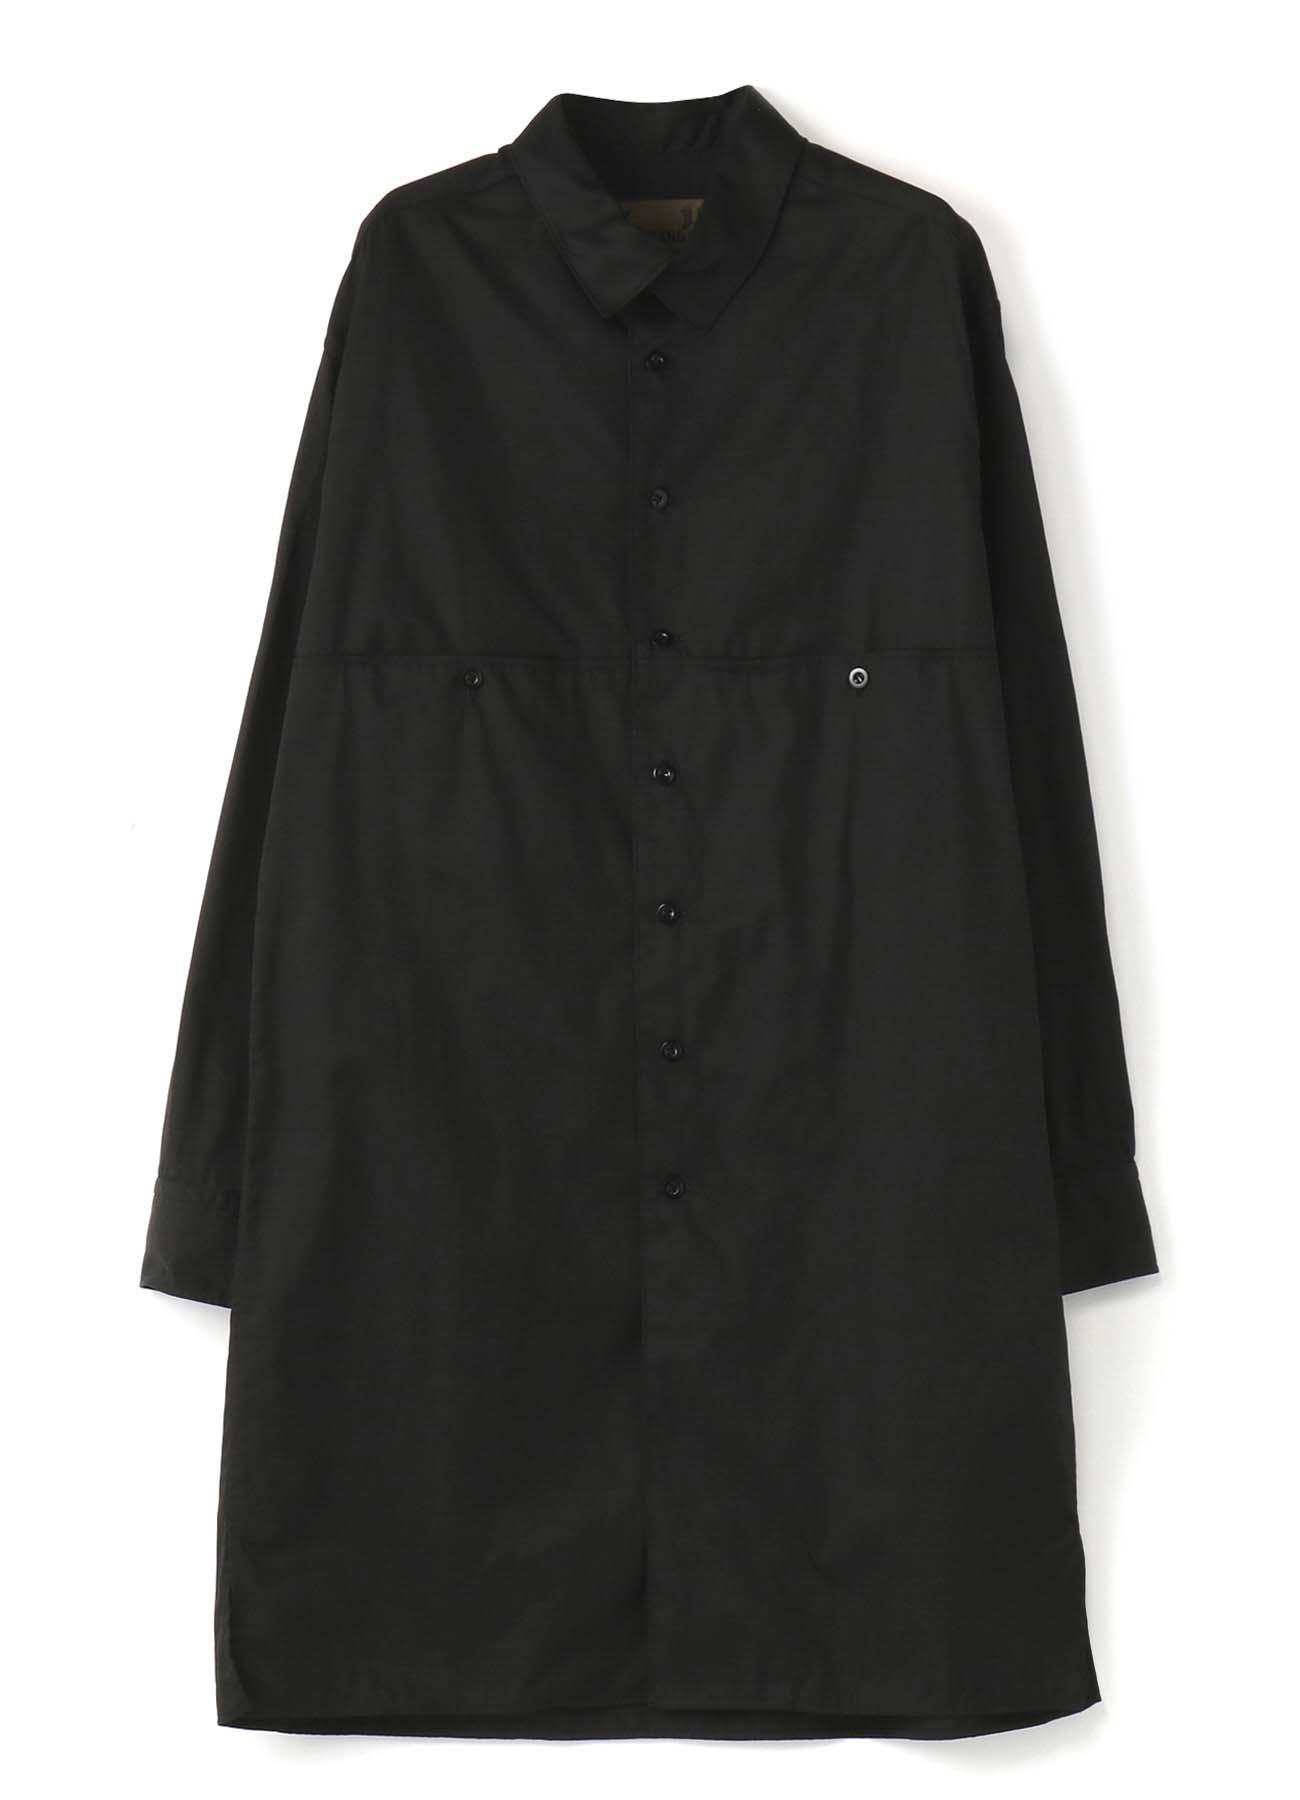 No.14 切り替えビッグシャツ バーバリー